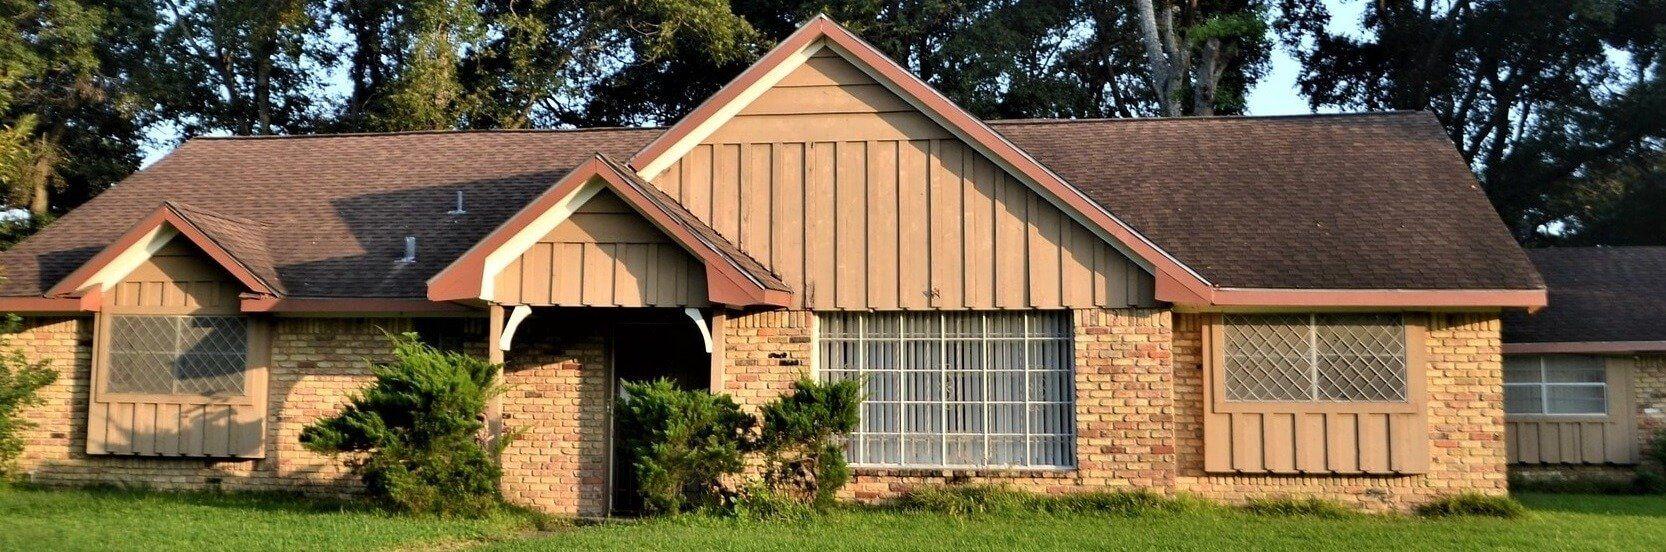 We Buy Houses Houston TX Refinance mortgage